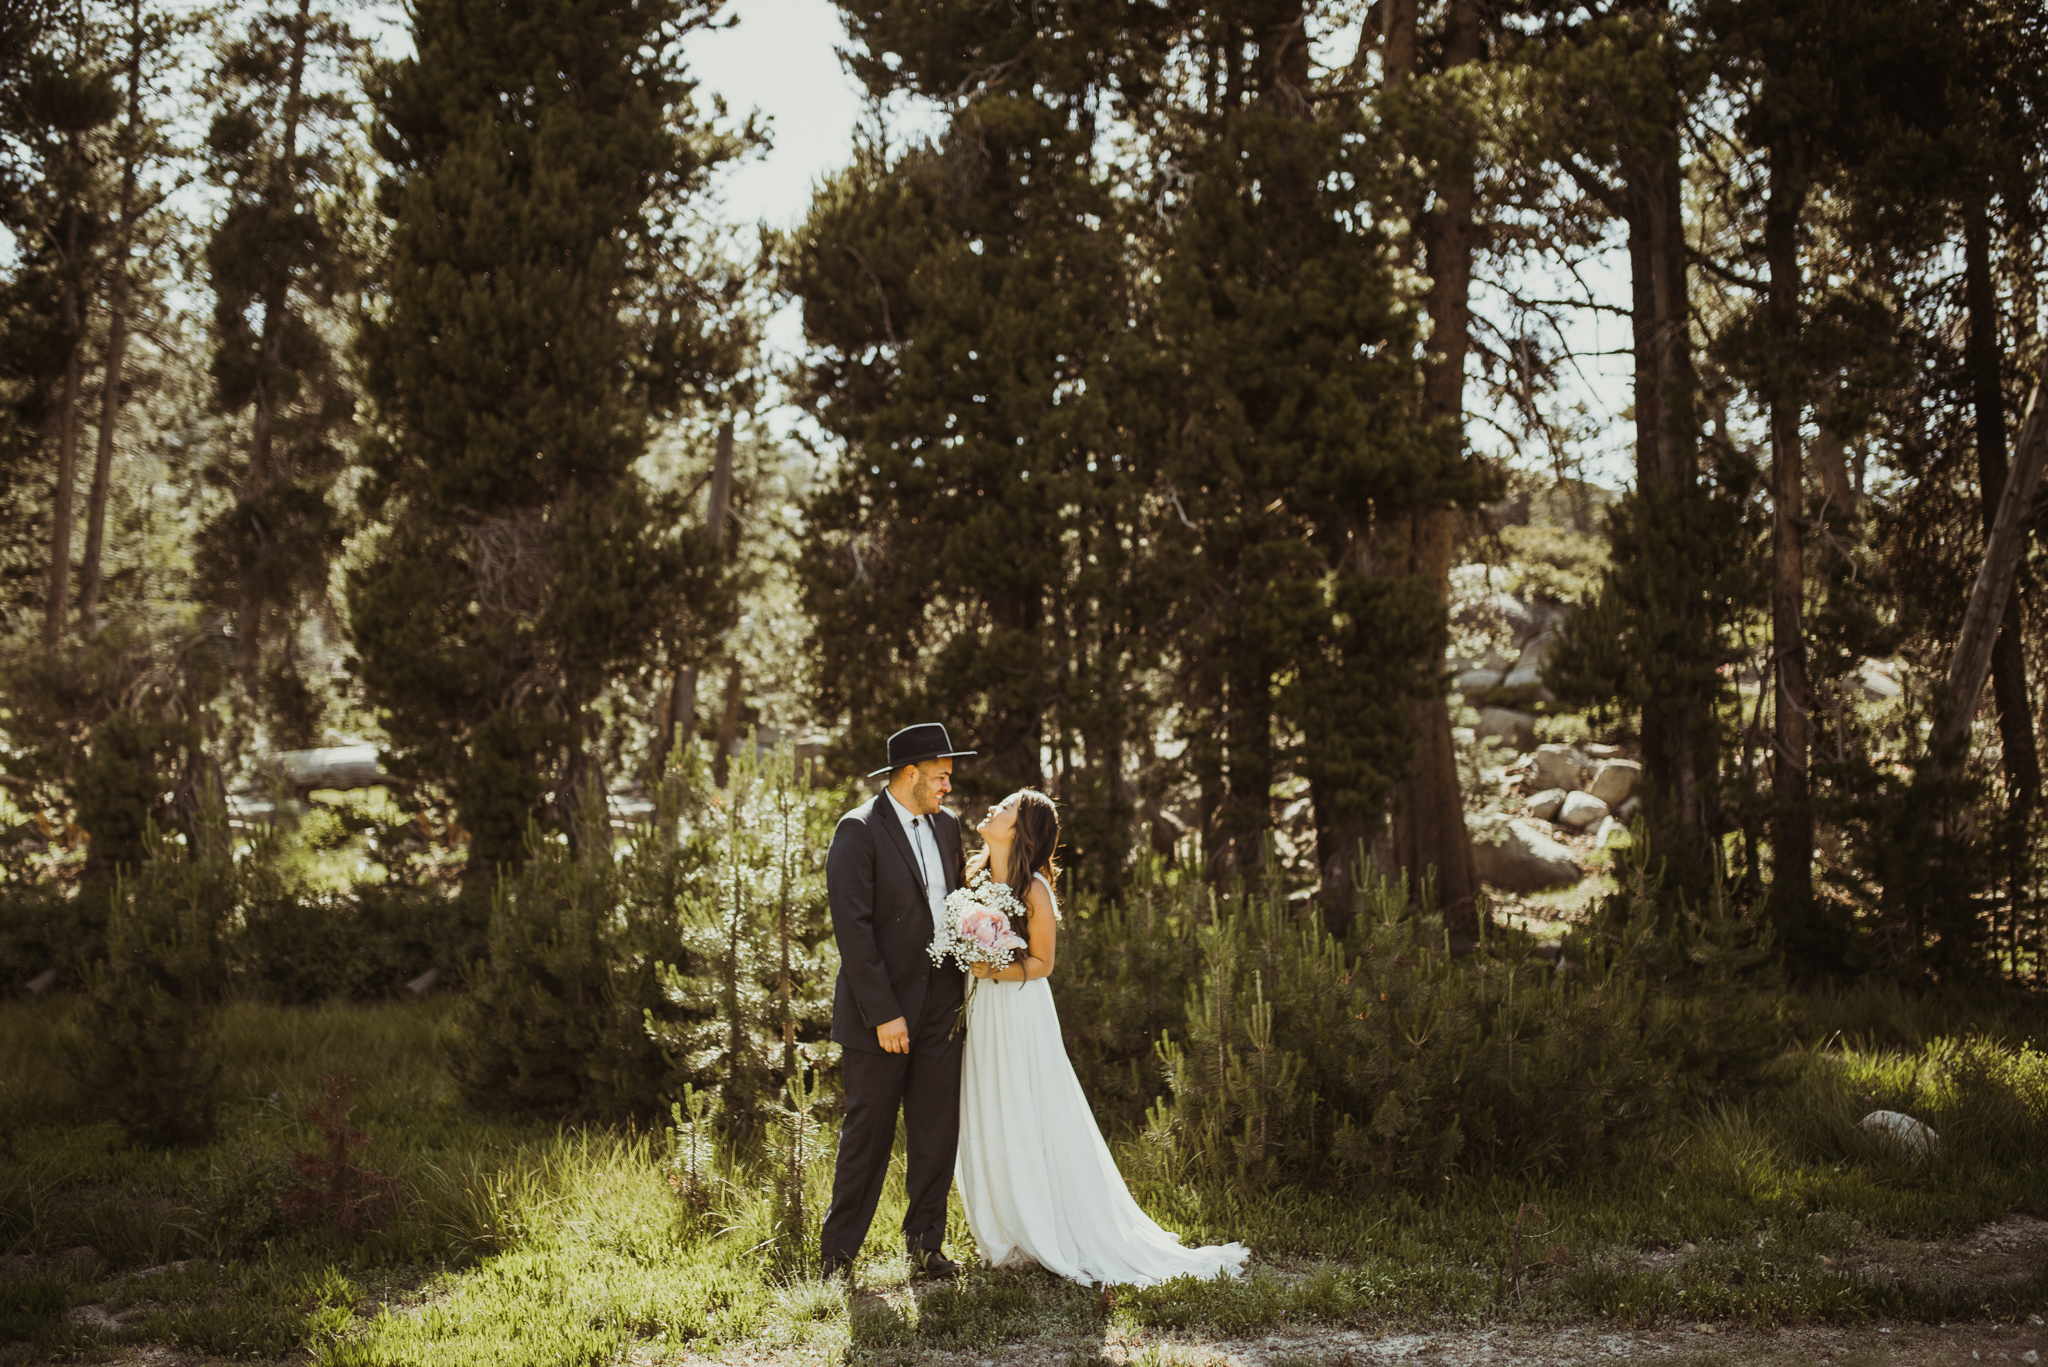 ©Isaiah & Taylor Photography -The Hideout Wedding, Kirkwood California, Lake Tahoe Wedding Photographer-89.jpg